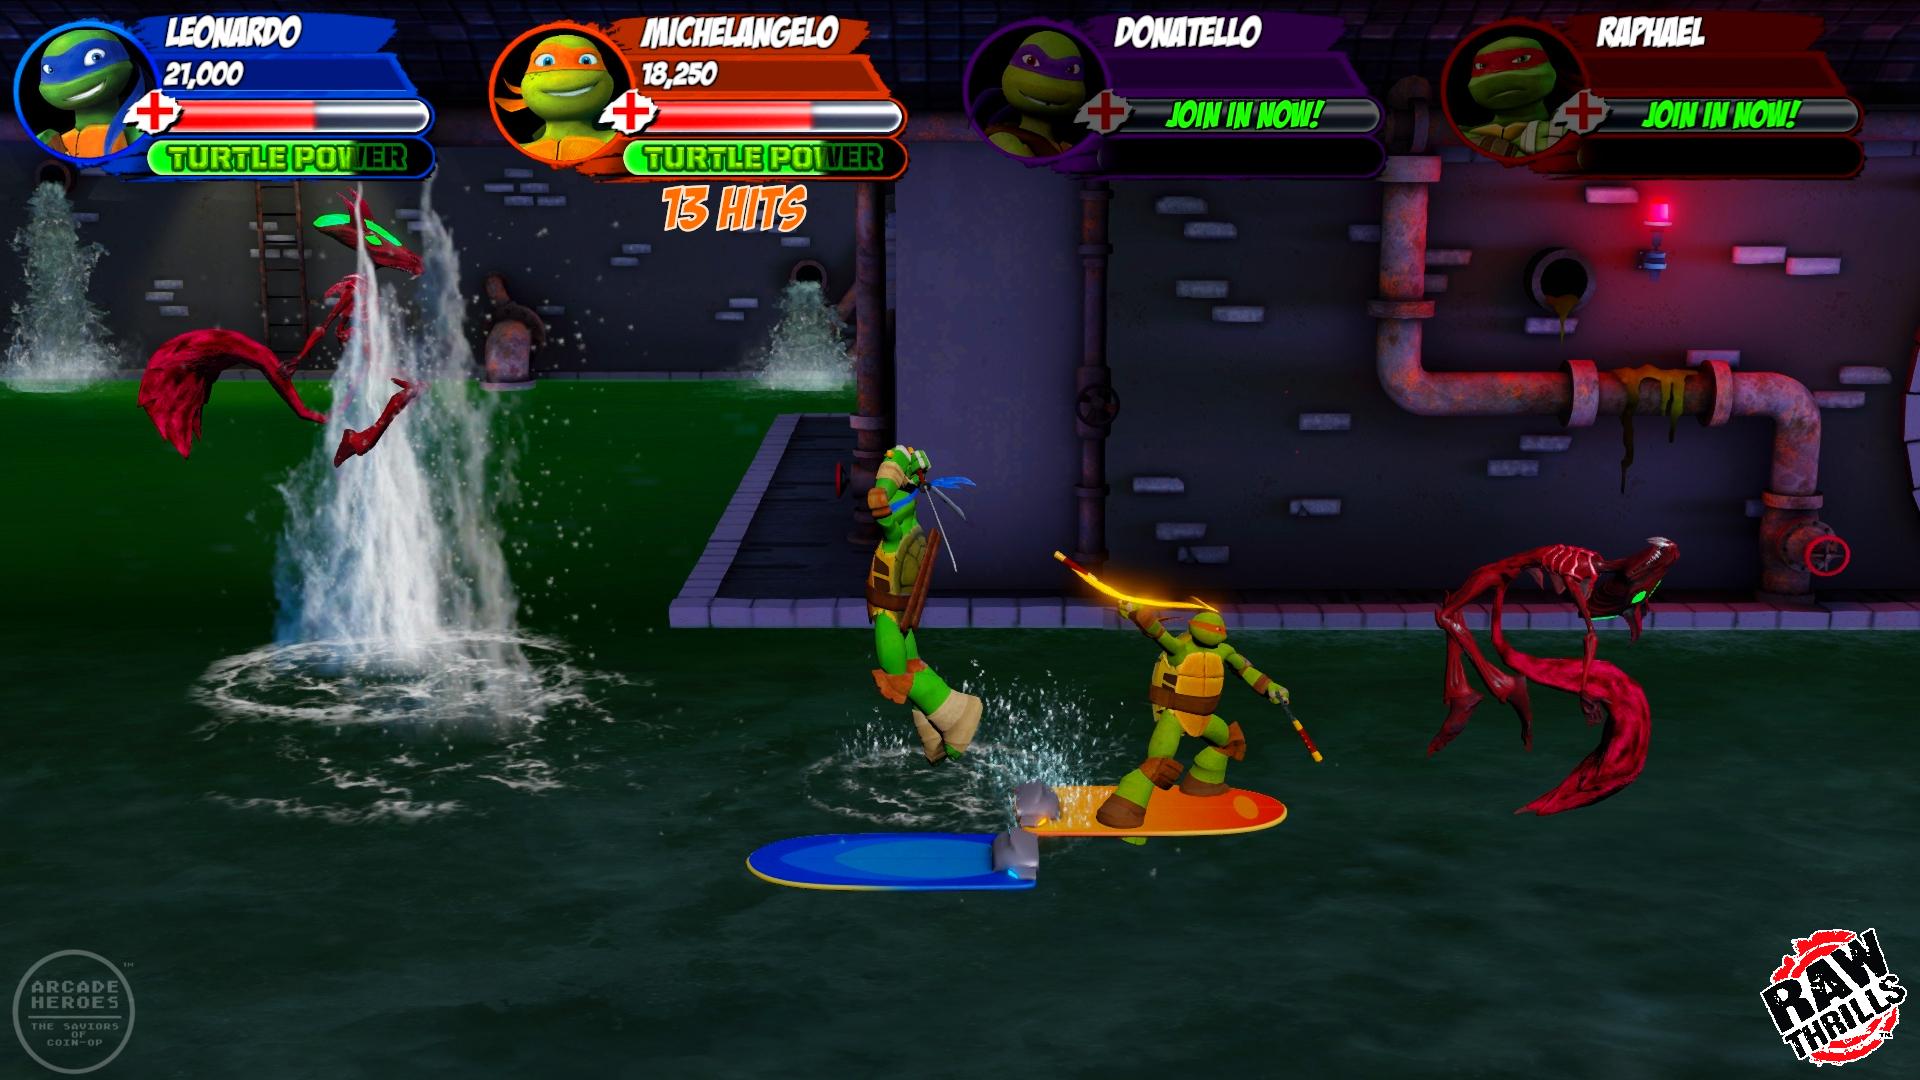 Arcade Heroes Sewer Level & Shredder's Throne Room Revealed